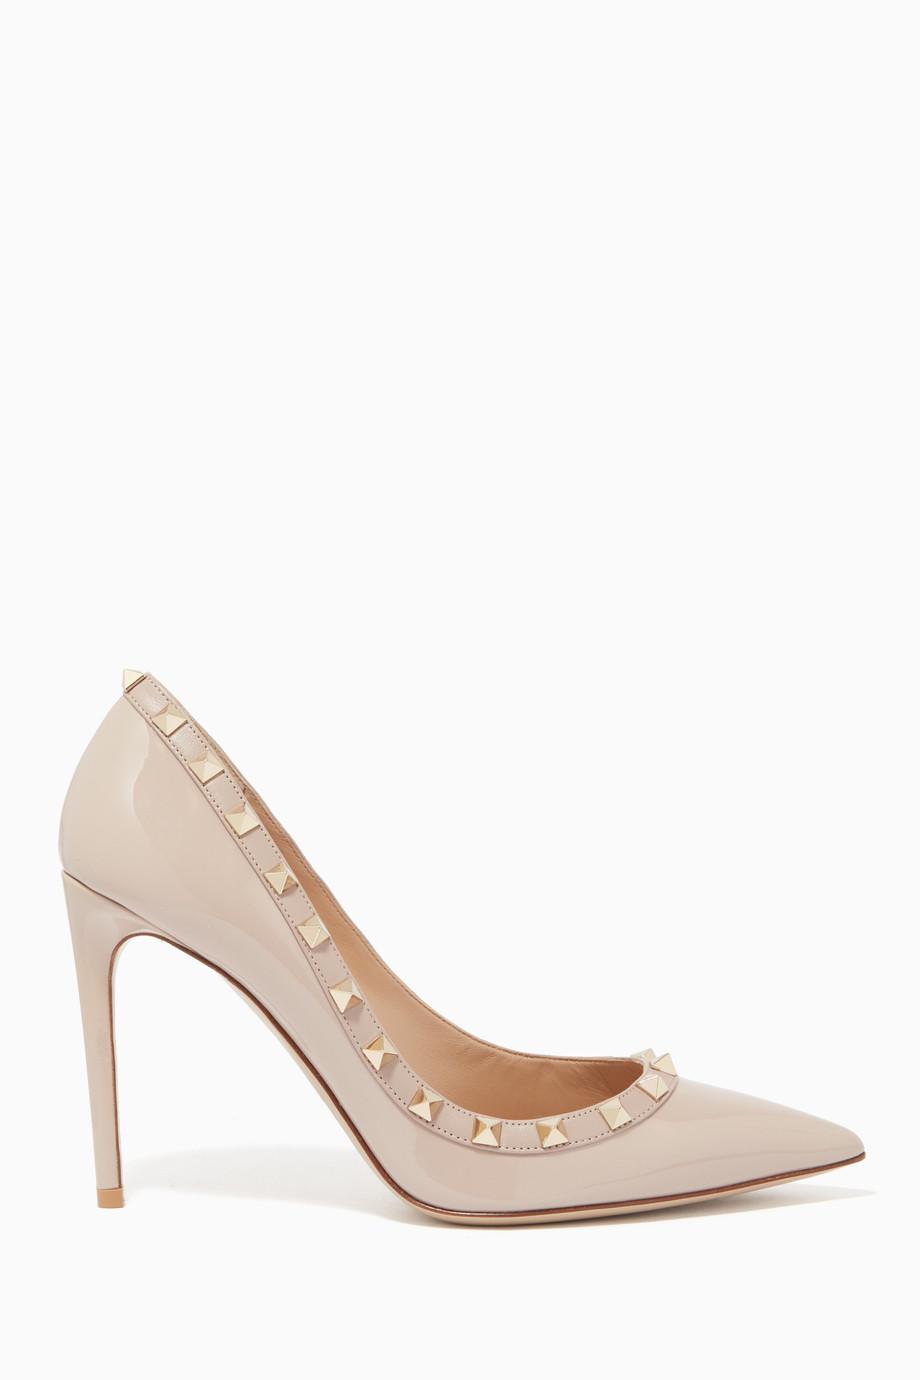 dc712e16a تسوق حذاء كعب عالي روكستد جلد لامع لونين بودر فالنتينو لون طبيعى ...